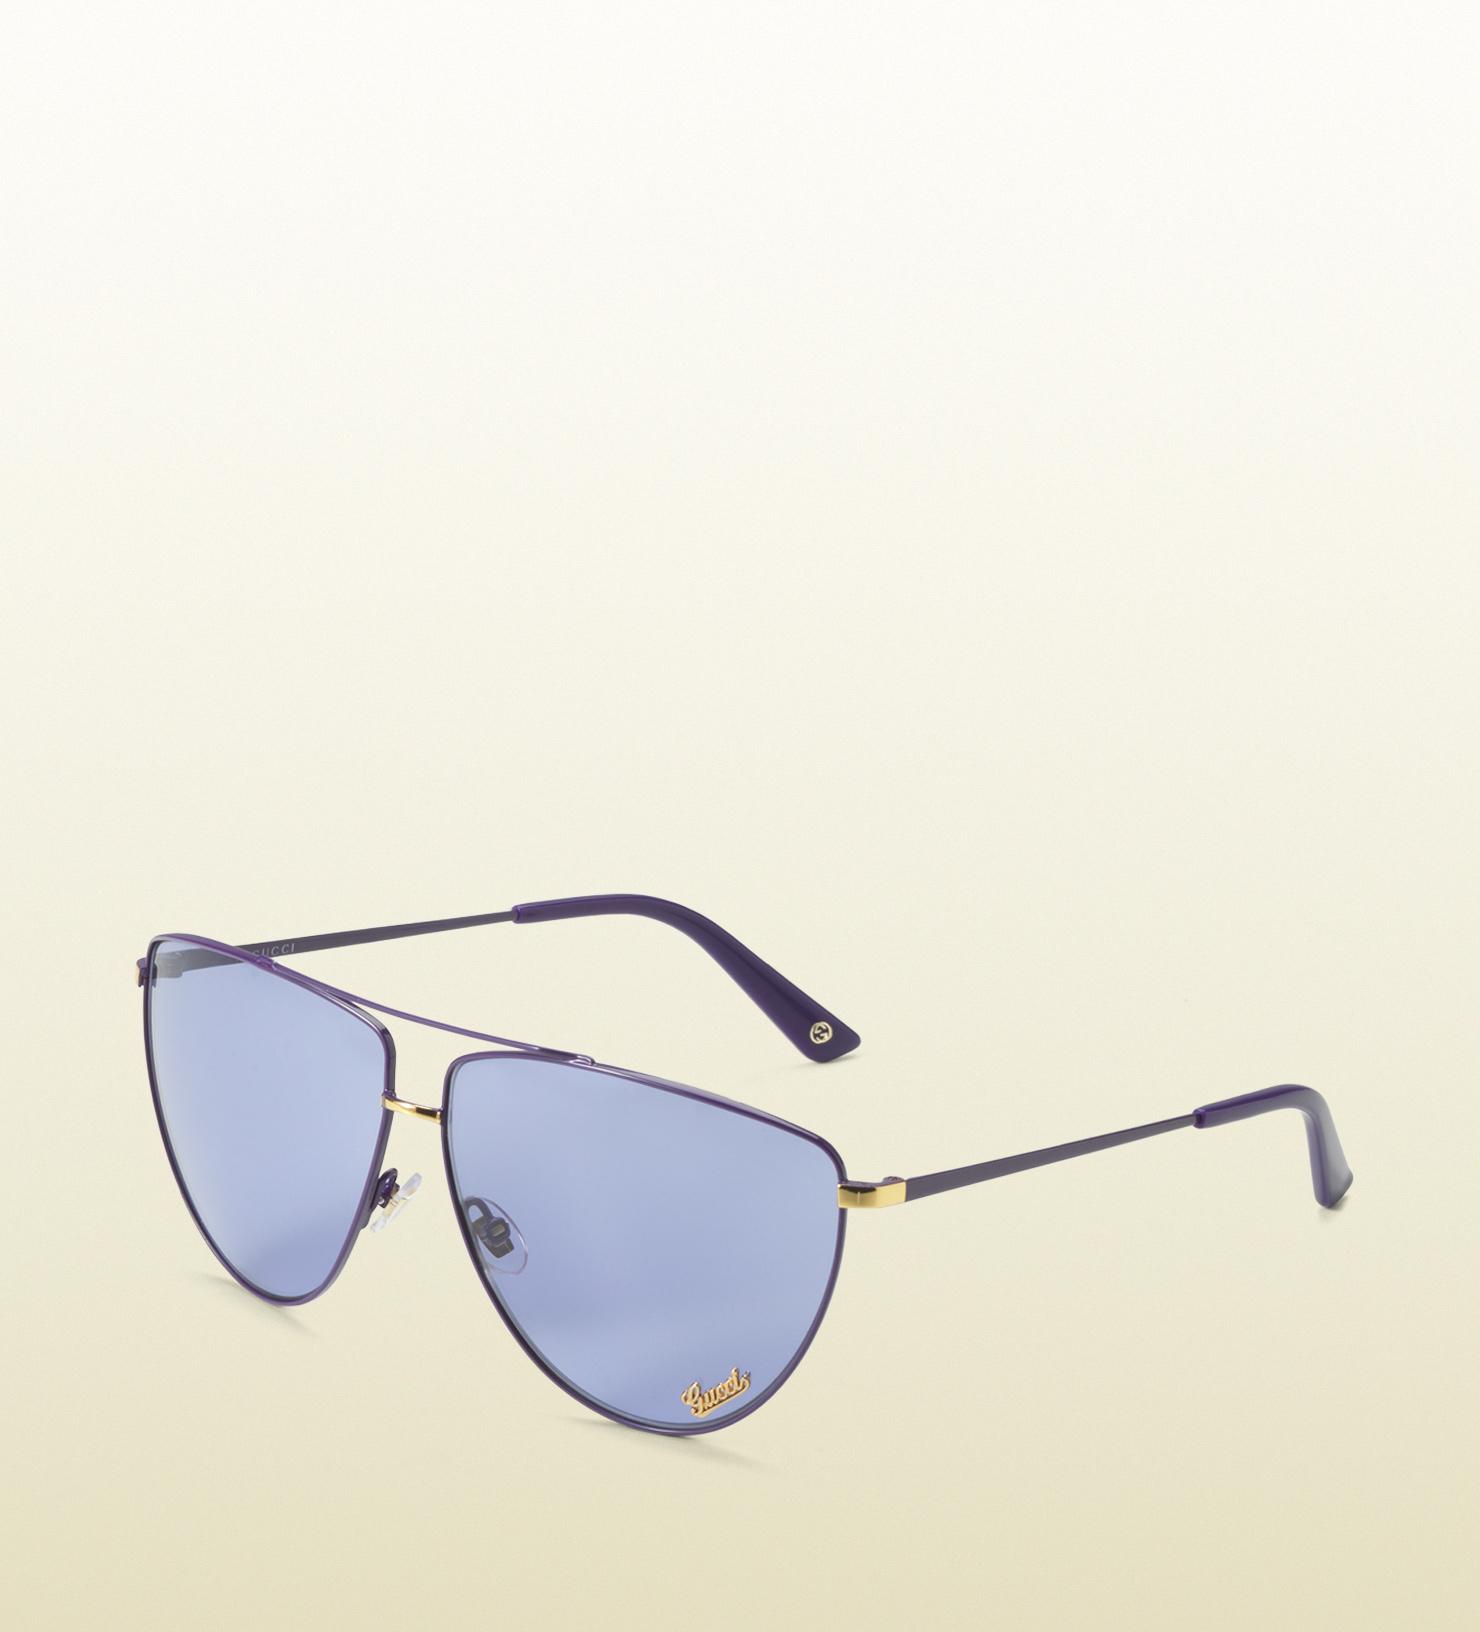 26de3eea14a Lyst - Gucci Medium Oval Frame Sunglasses with Gucci Script Plaque ...